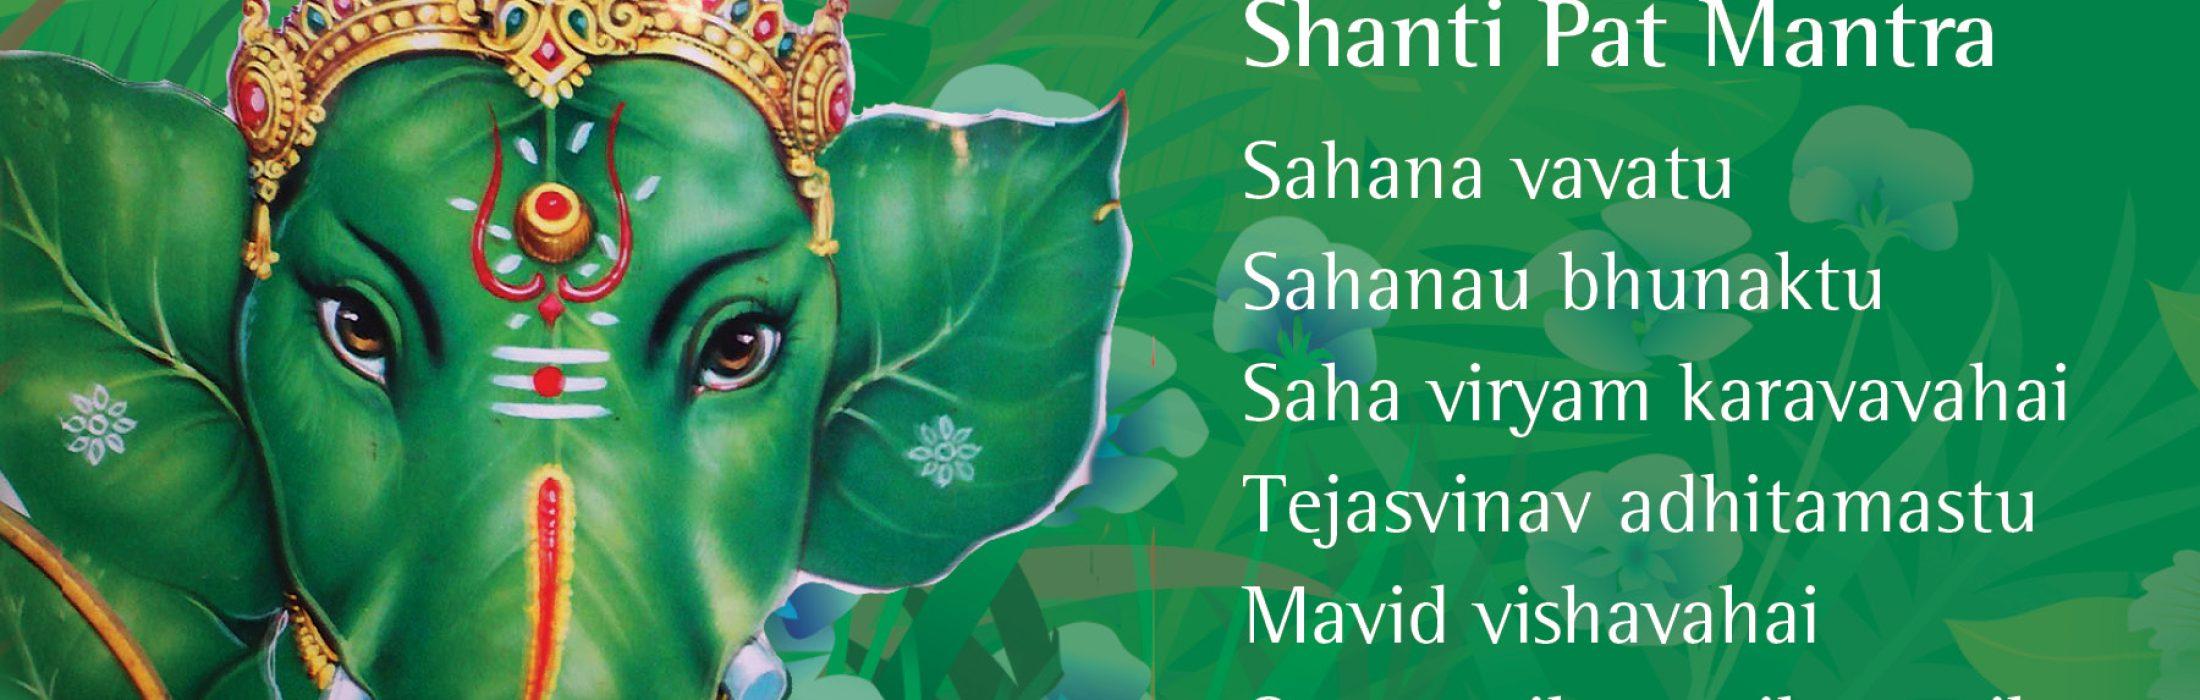 shanti-path